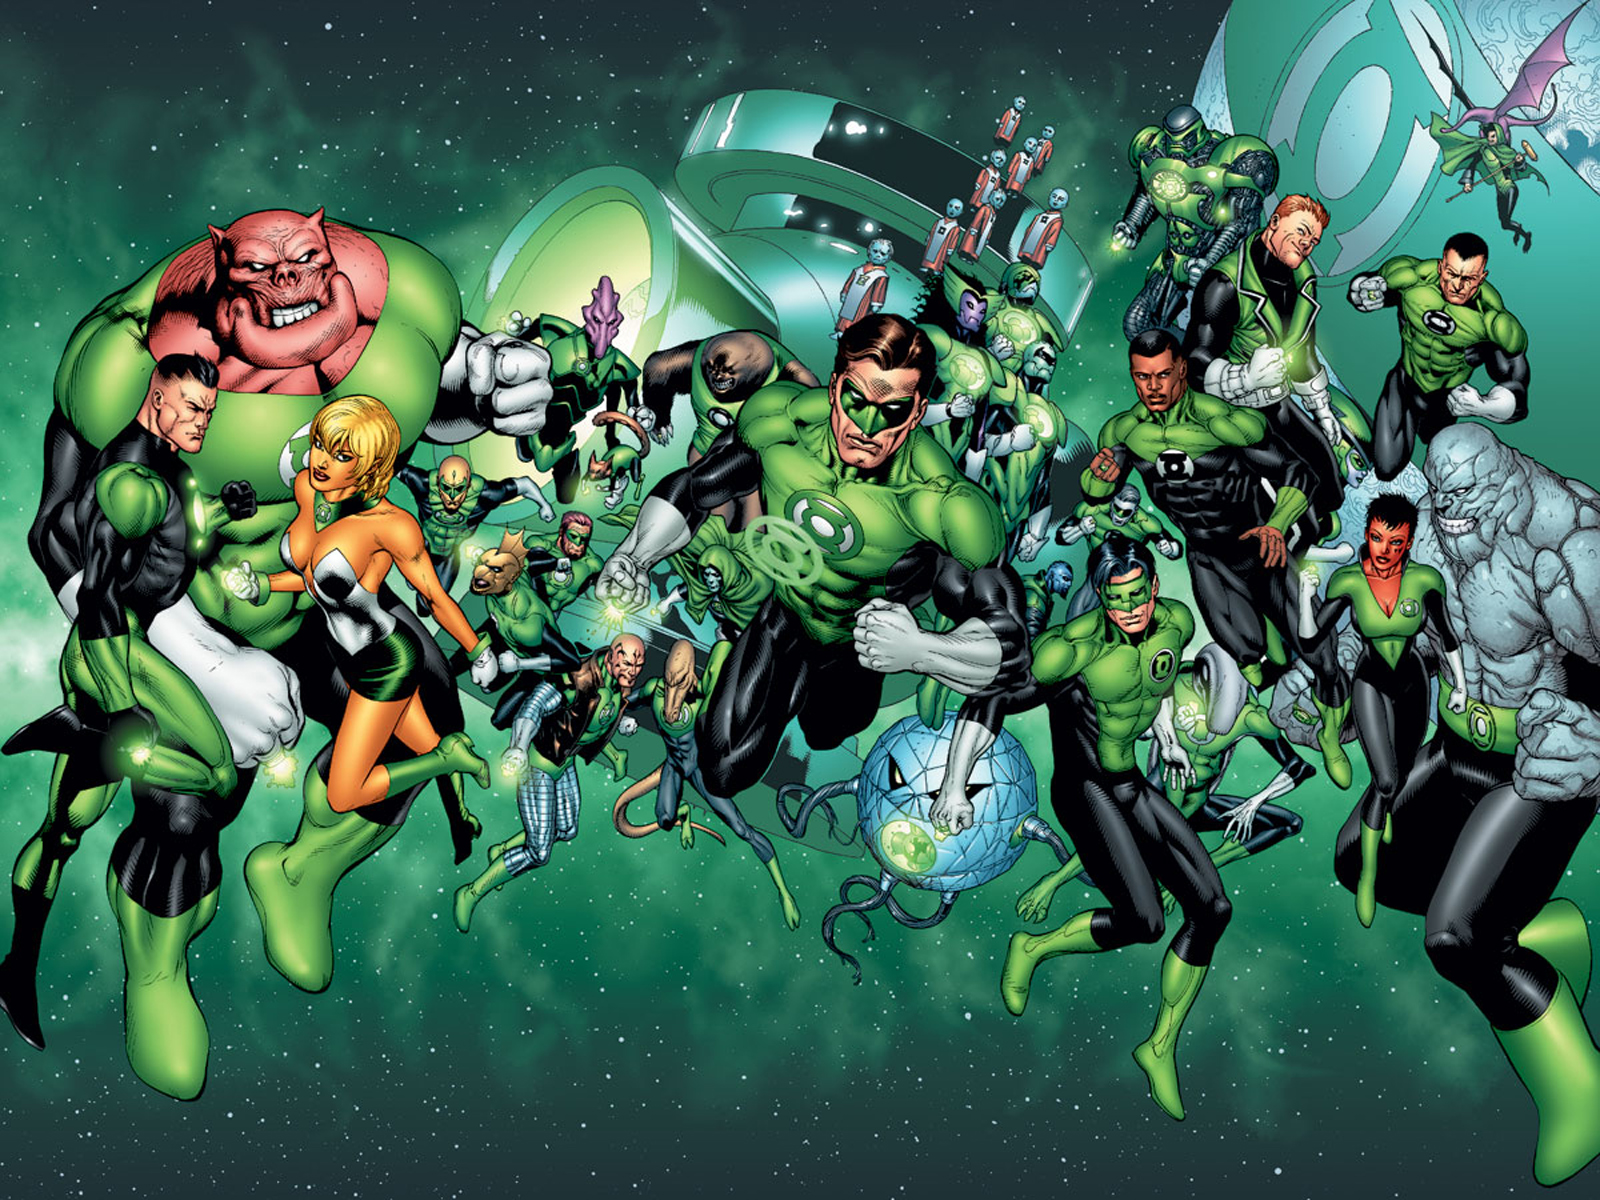 Green Lantern Dc Universe Online Wallpaper Gallery 1600x1200